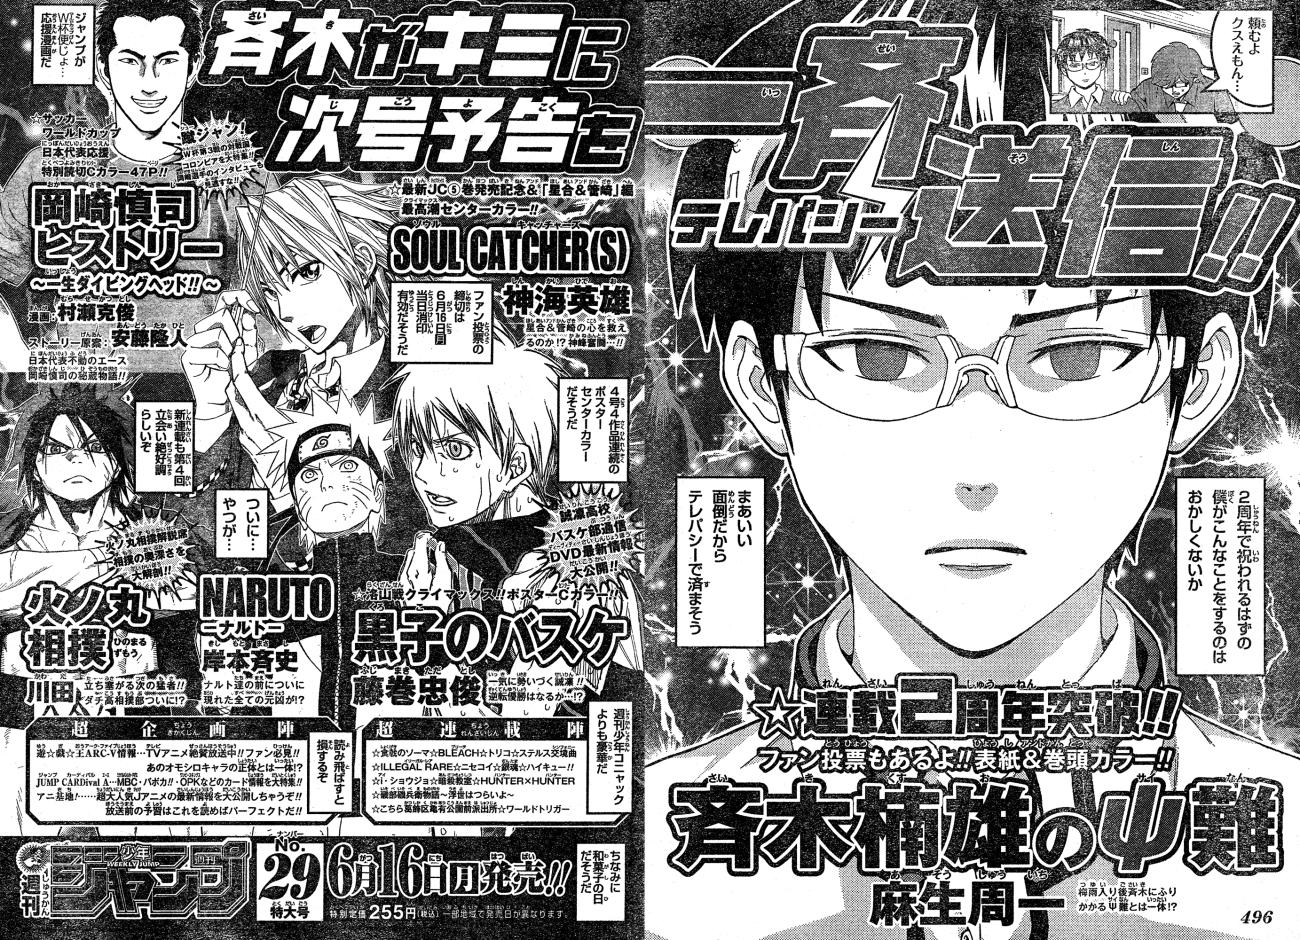 Dans Weekly Shonen Jump 2014 #29